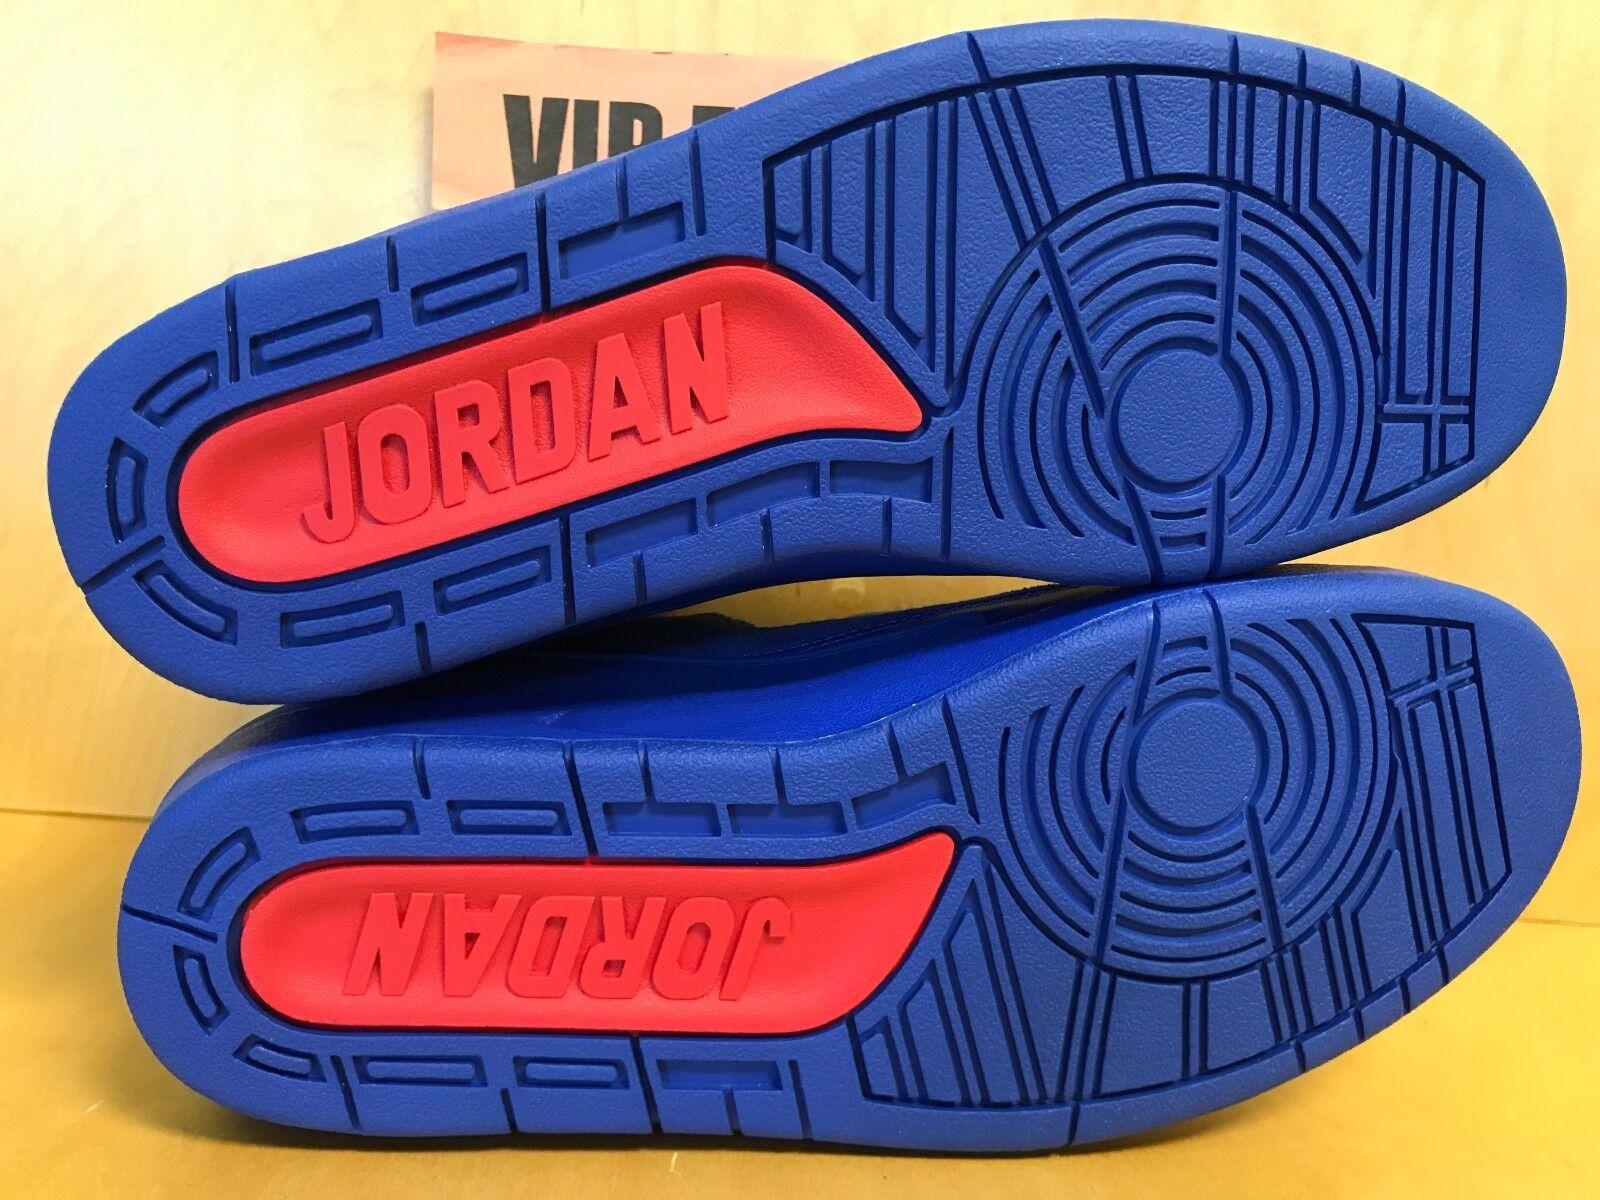 nike air jordan 2 retro - blauen ii - c - blauen - 717170-405 - die seltenste farbe 79814b